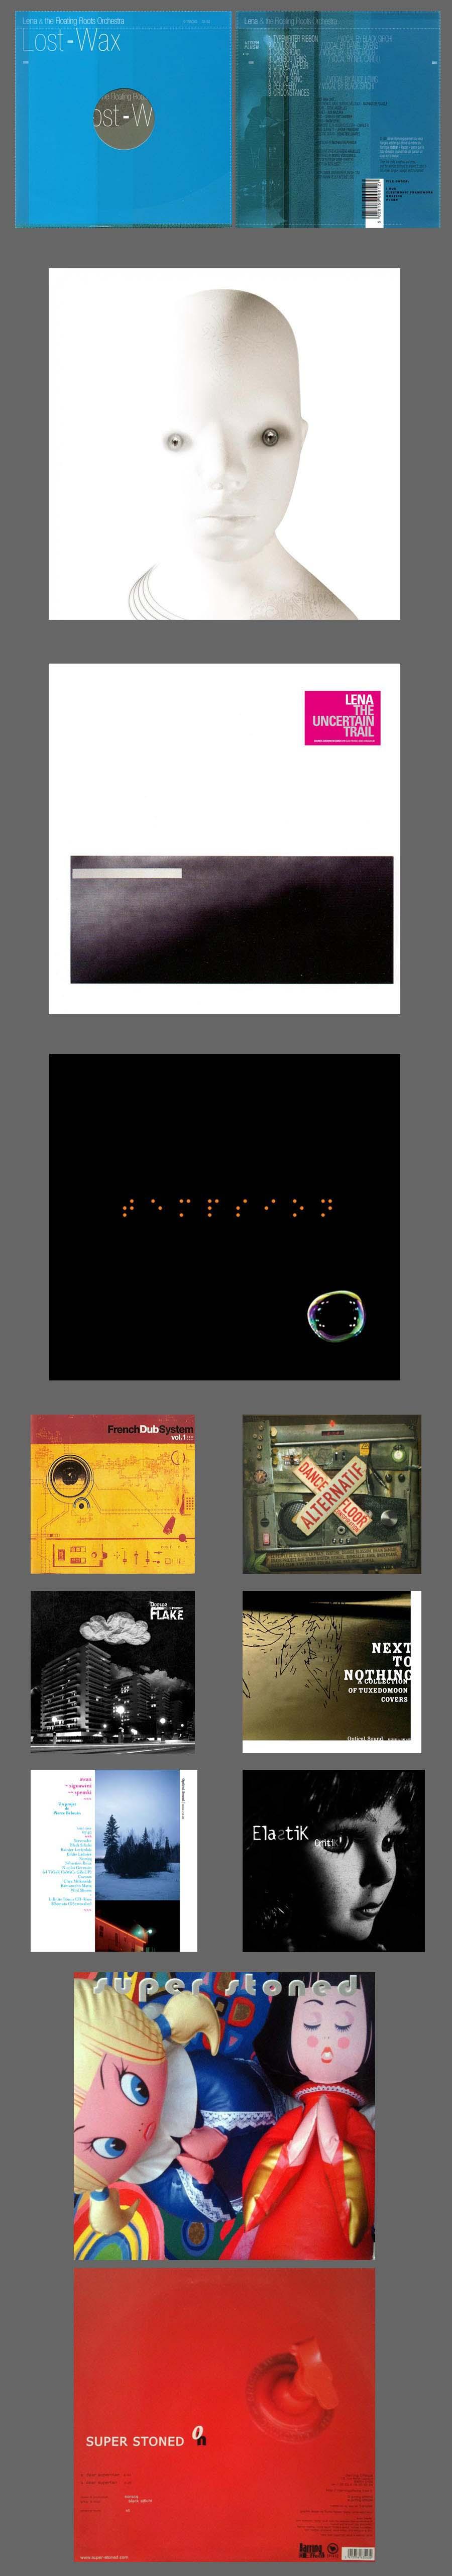 records part 2 wordpress